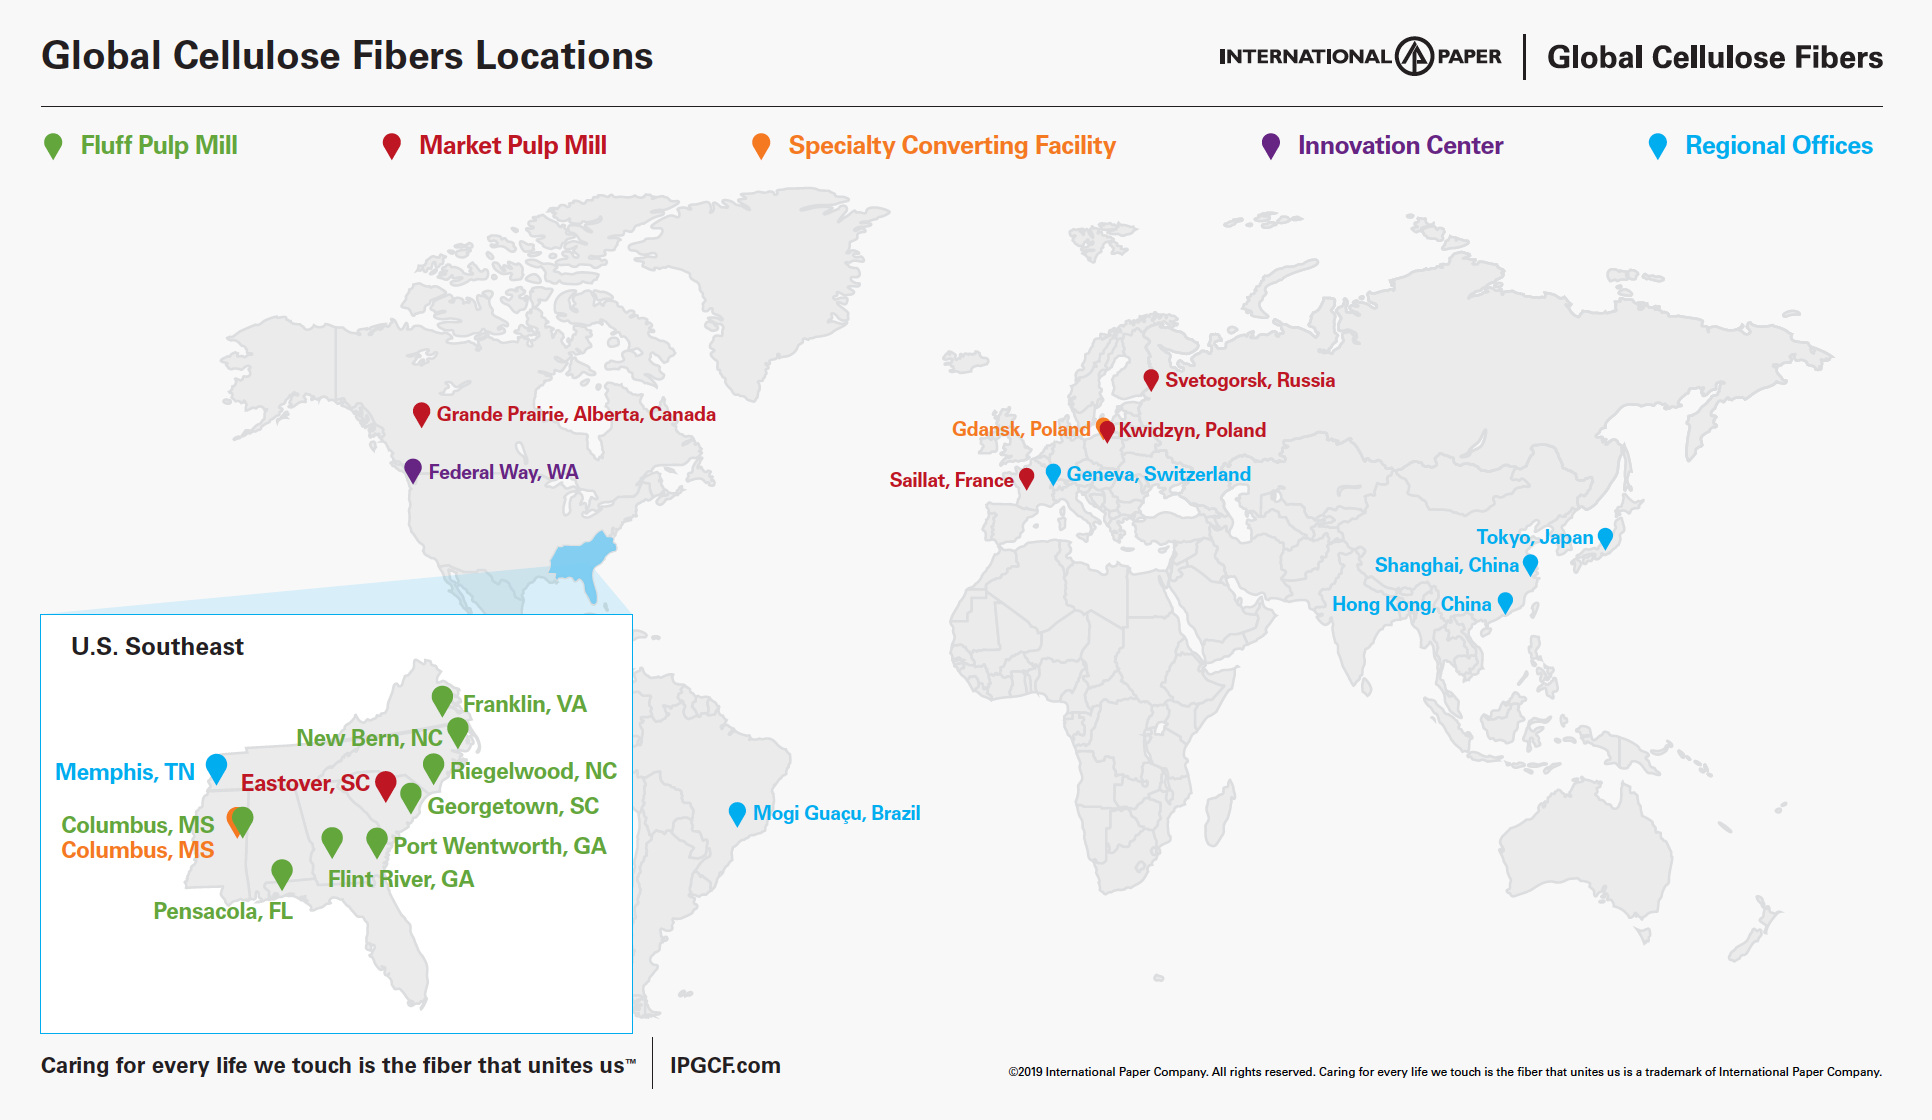 Map of IPGCF Locations